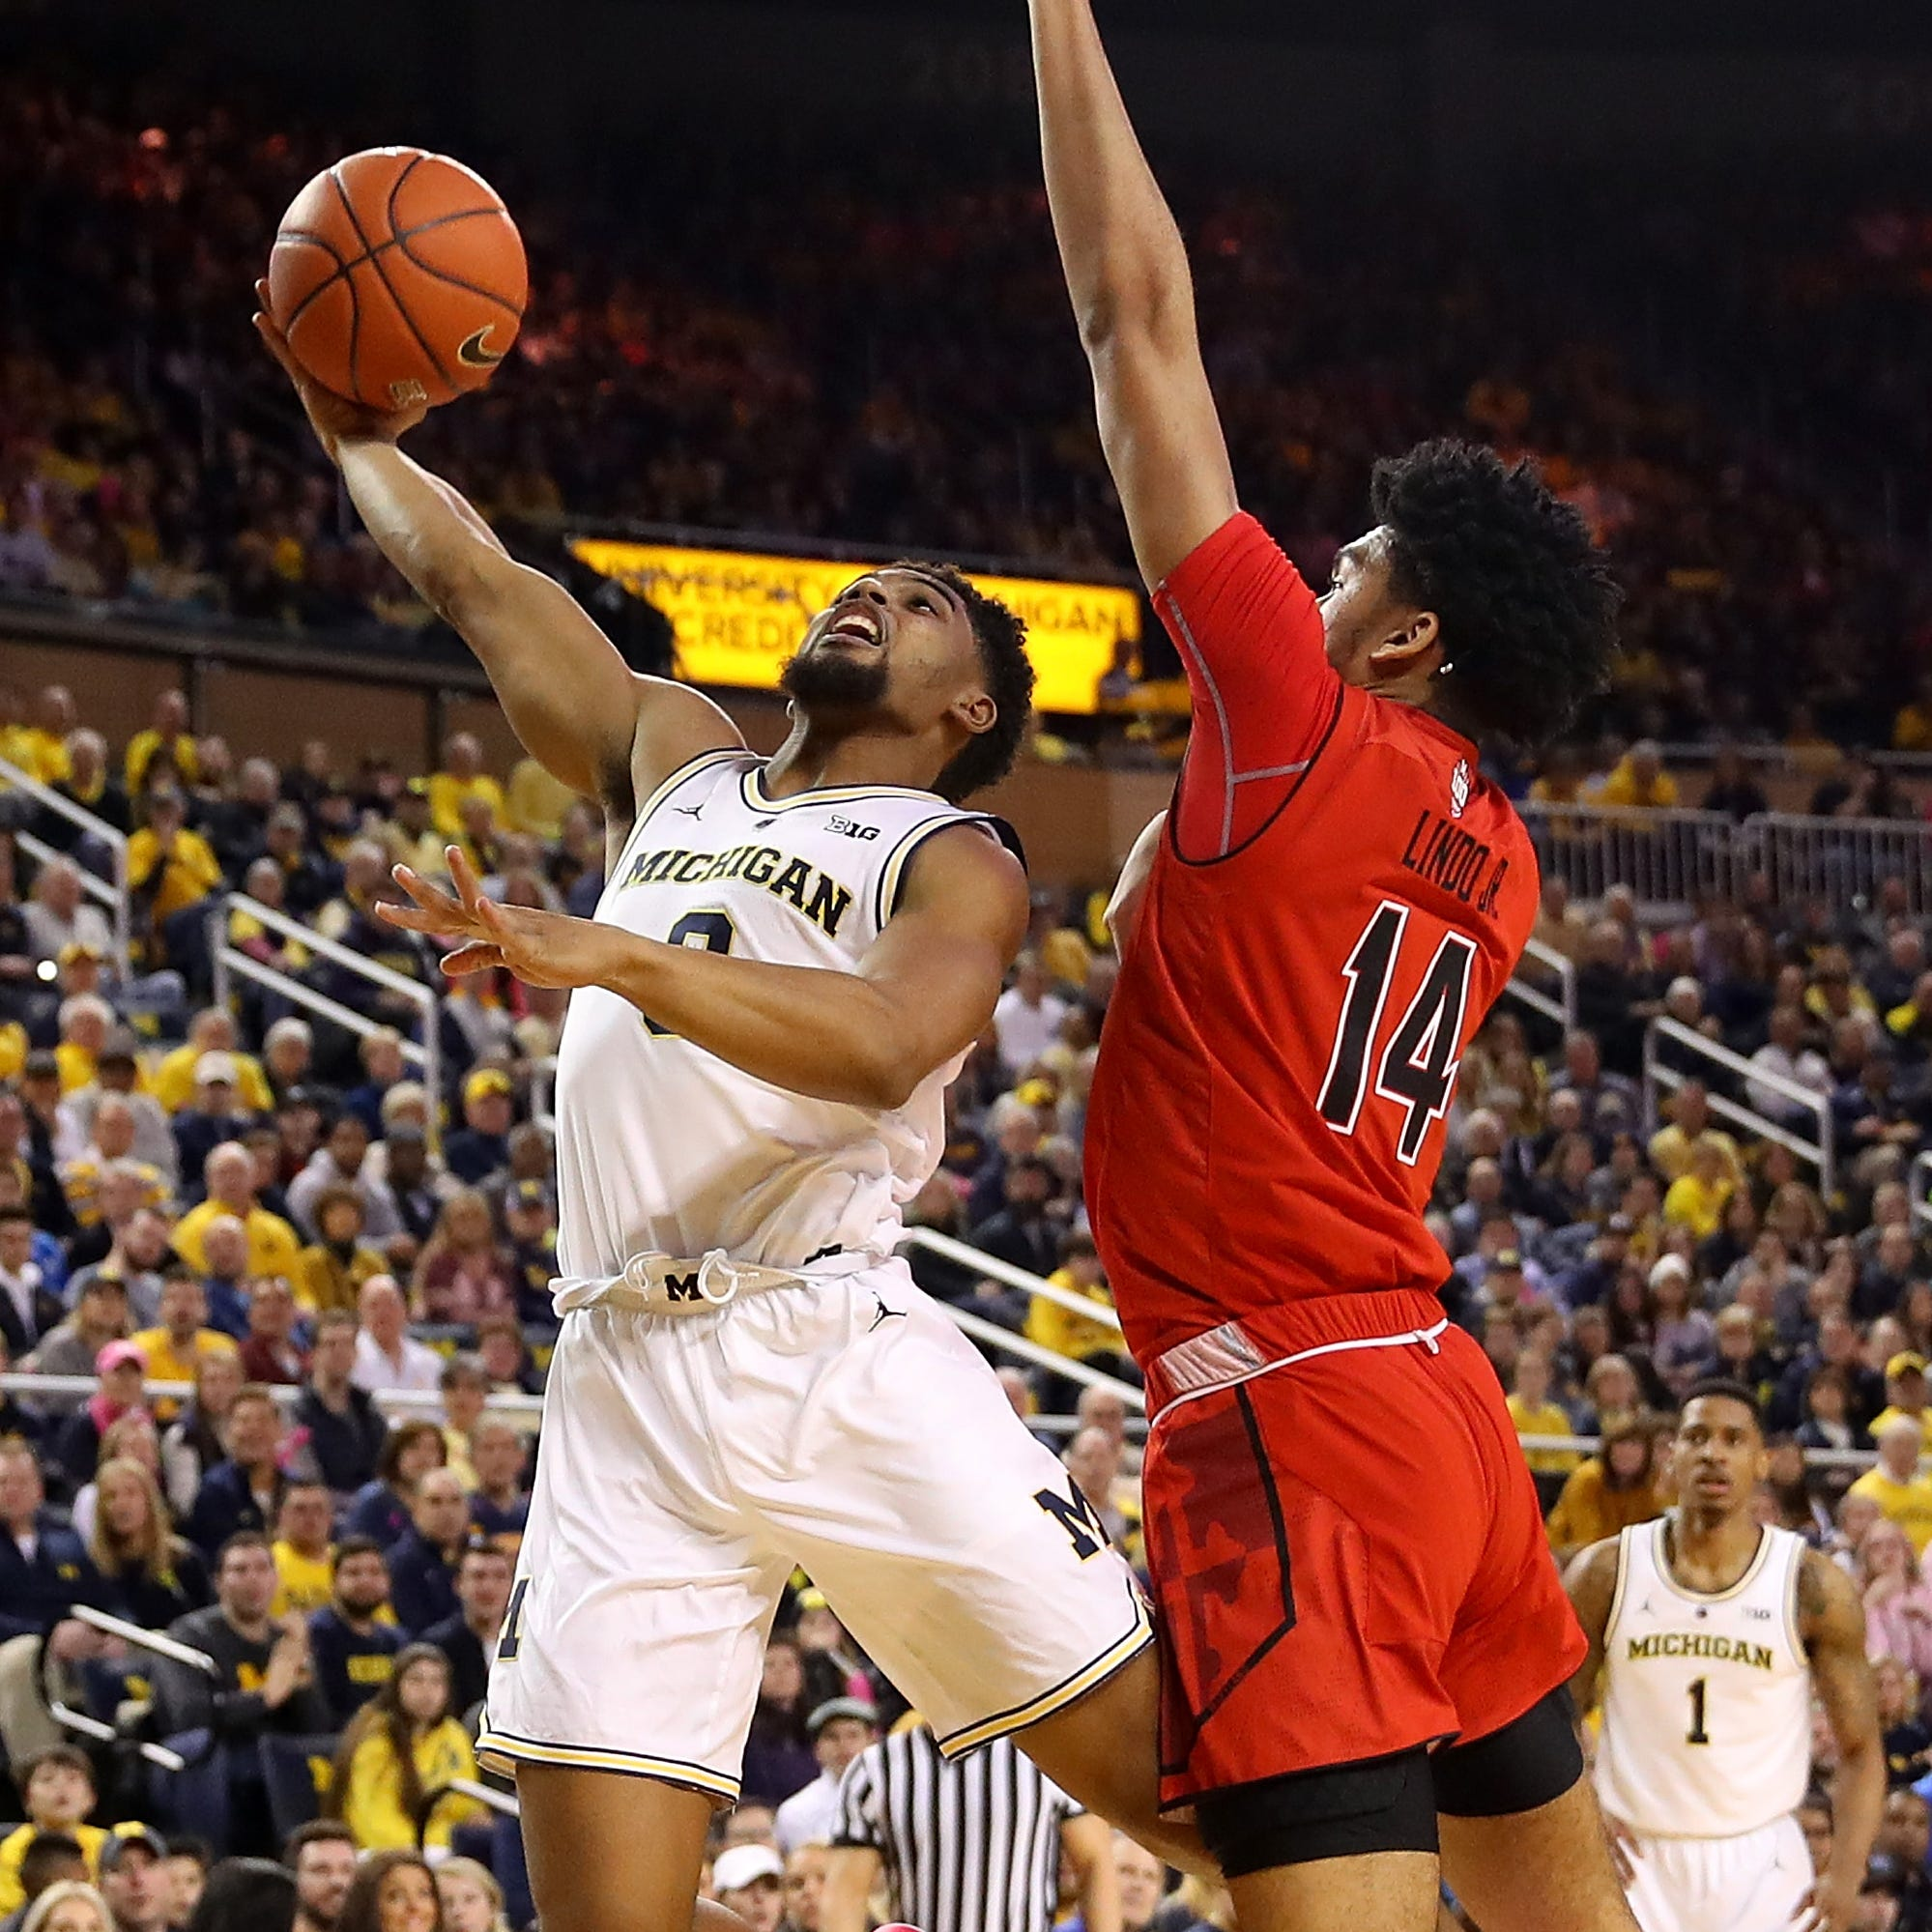 Michigan basketball freshman David DeJulius gets rare early playing time